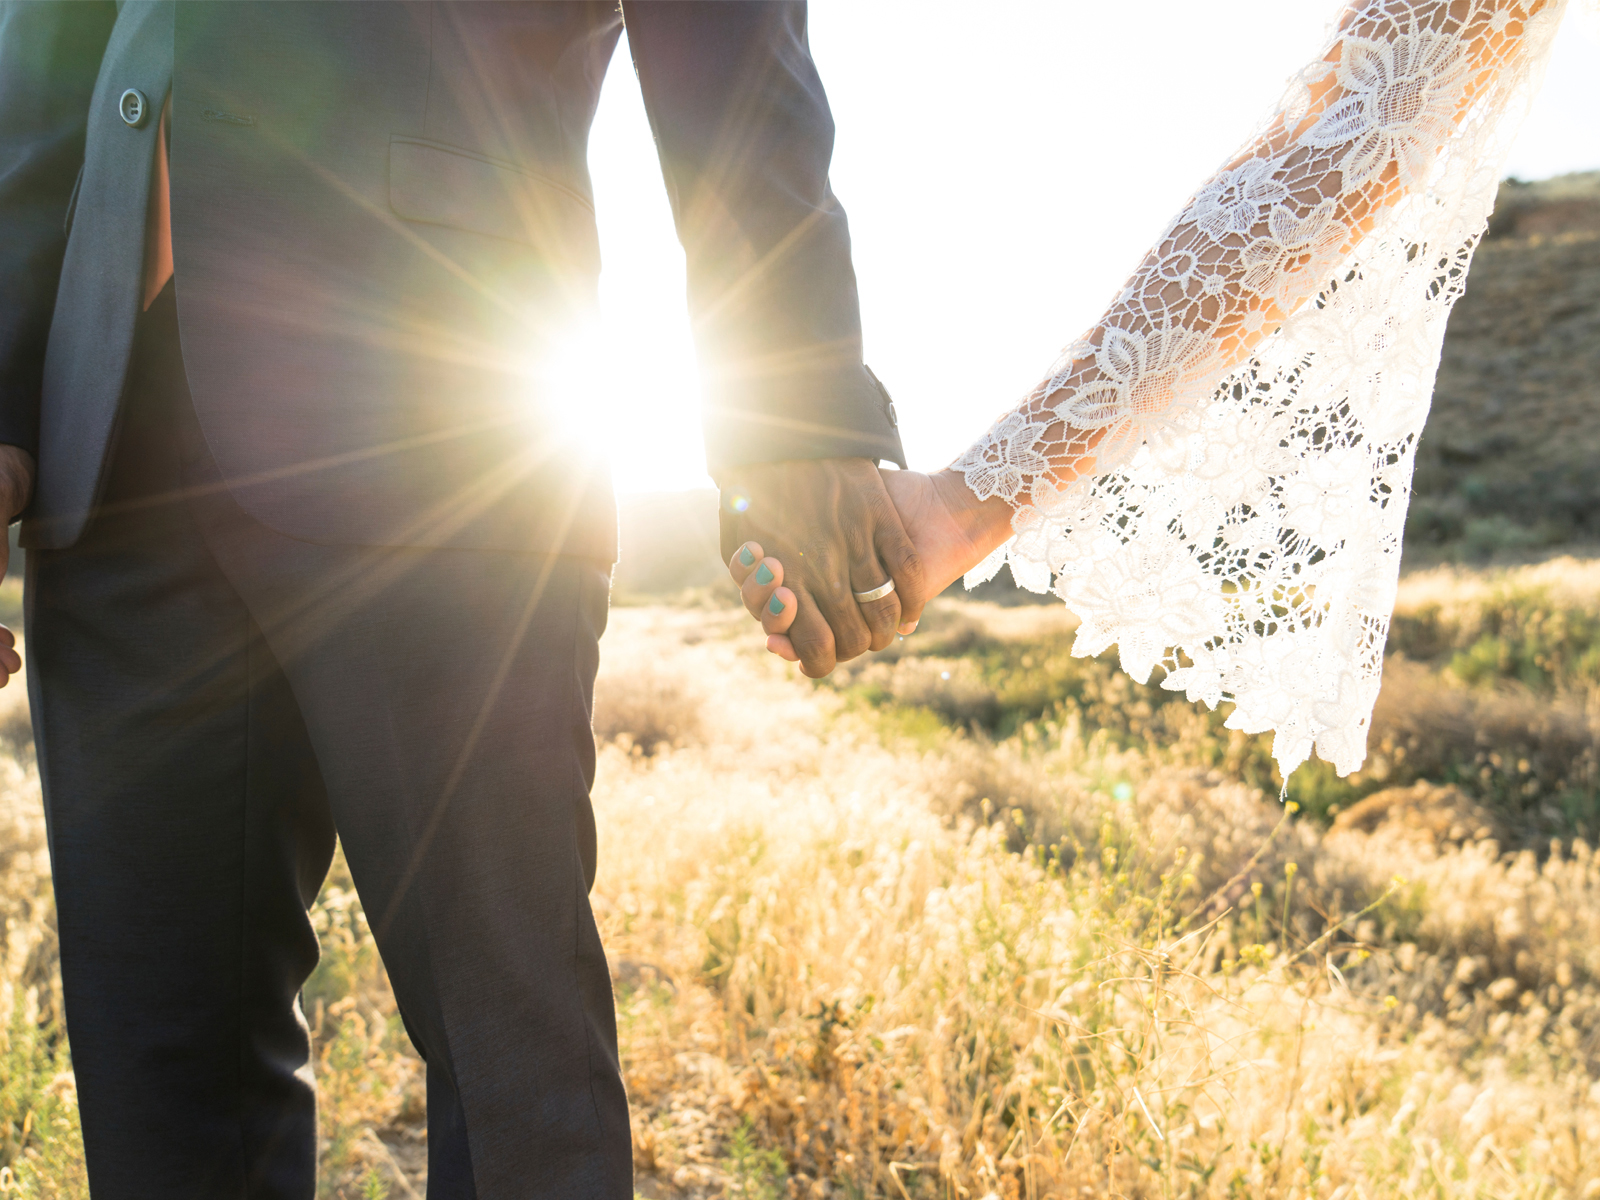 Cura dos relacionamentos entre casais